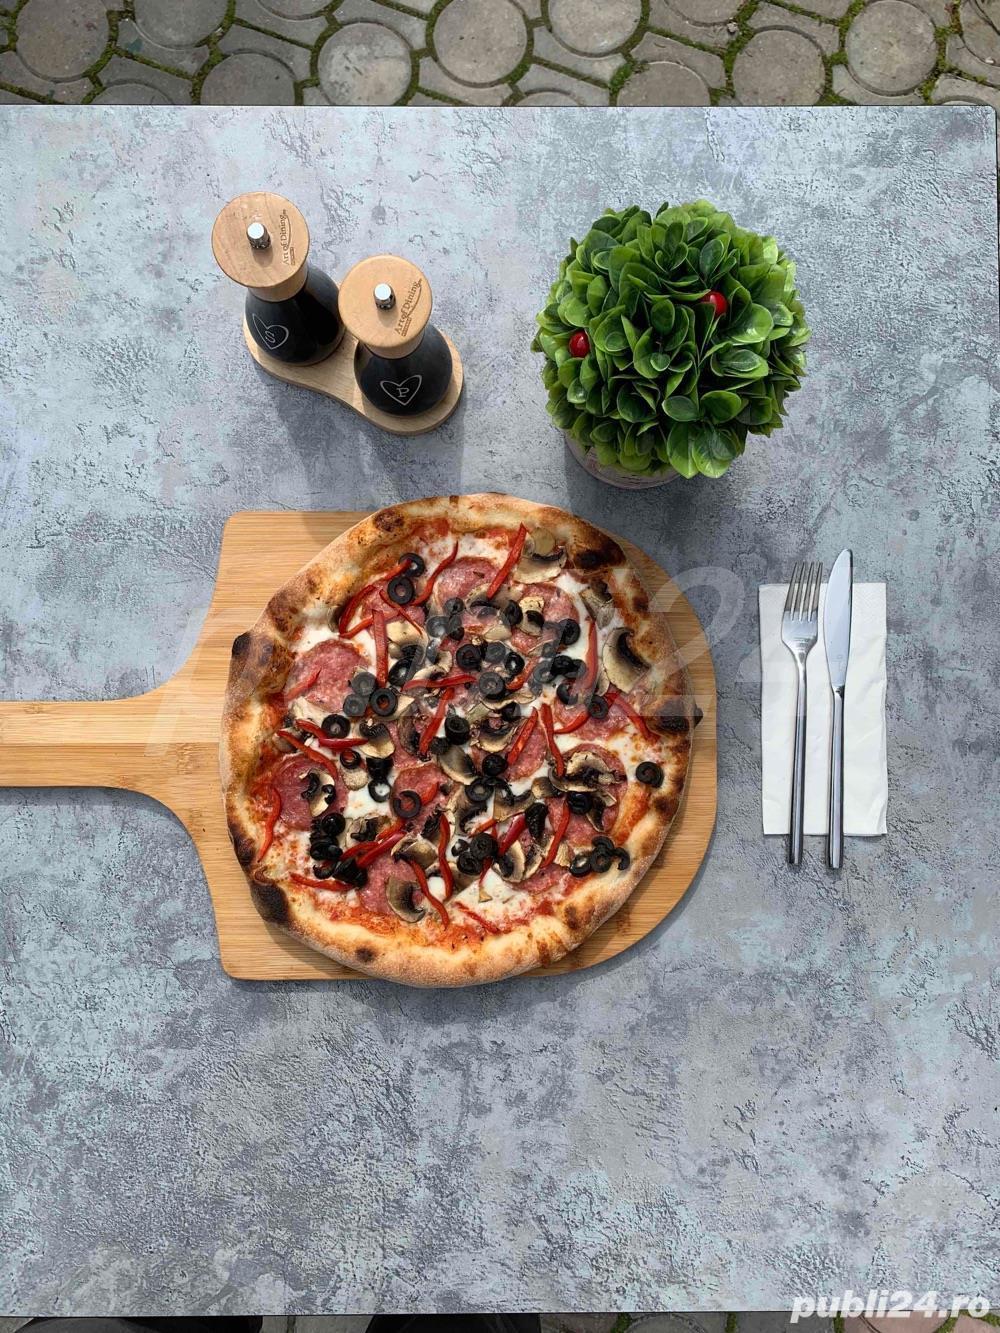 angajam pizzer/pizzar